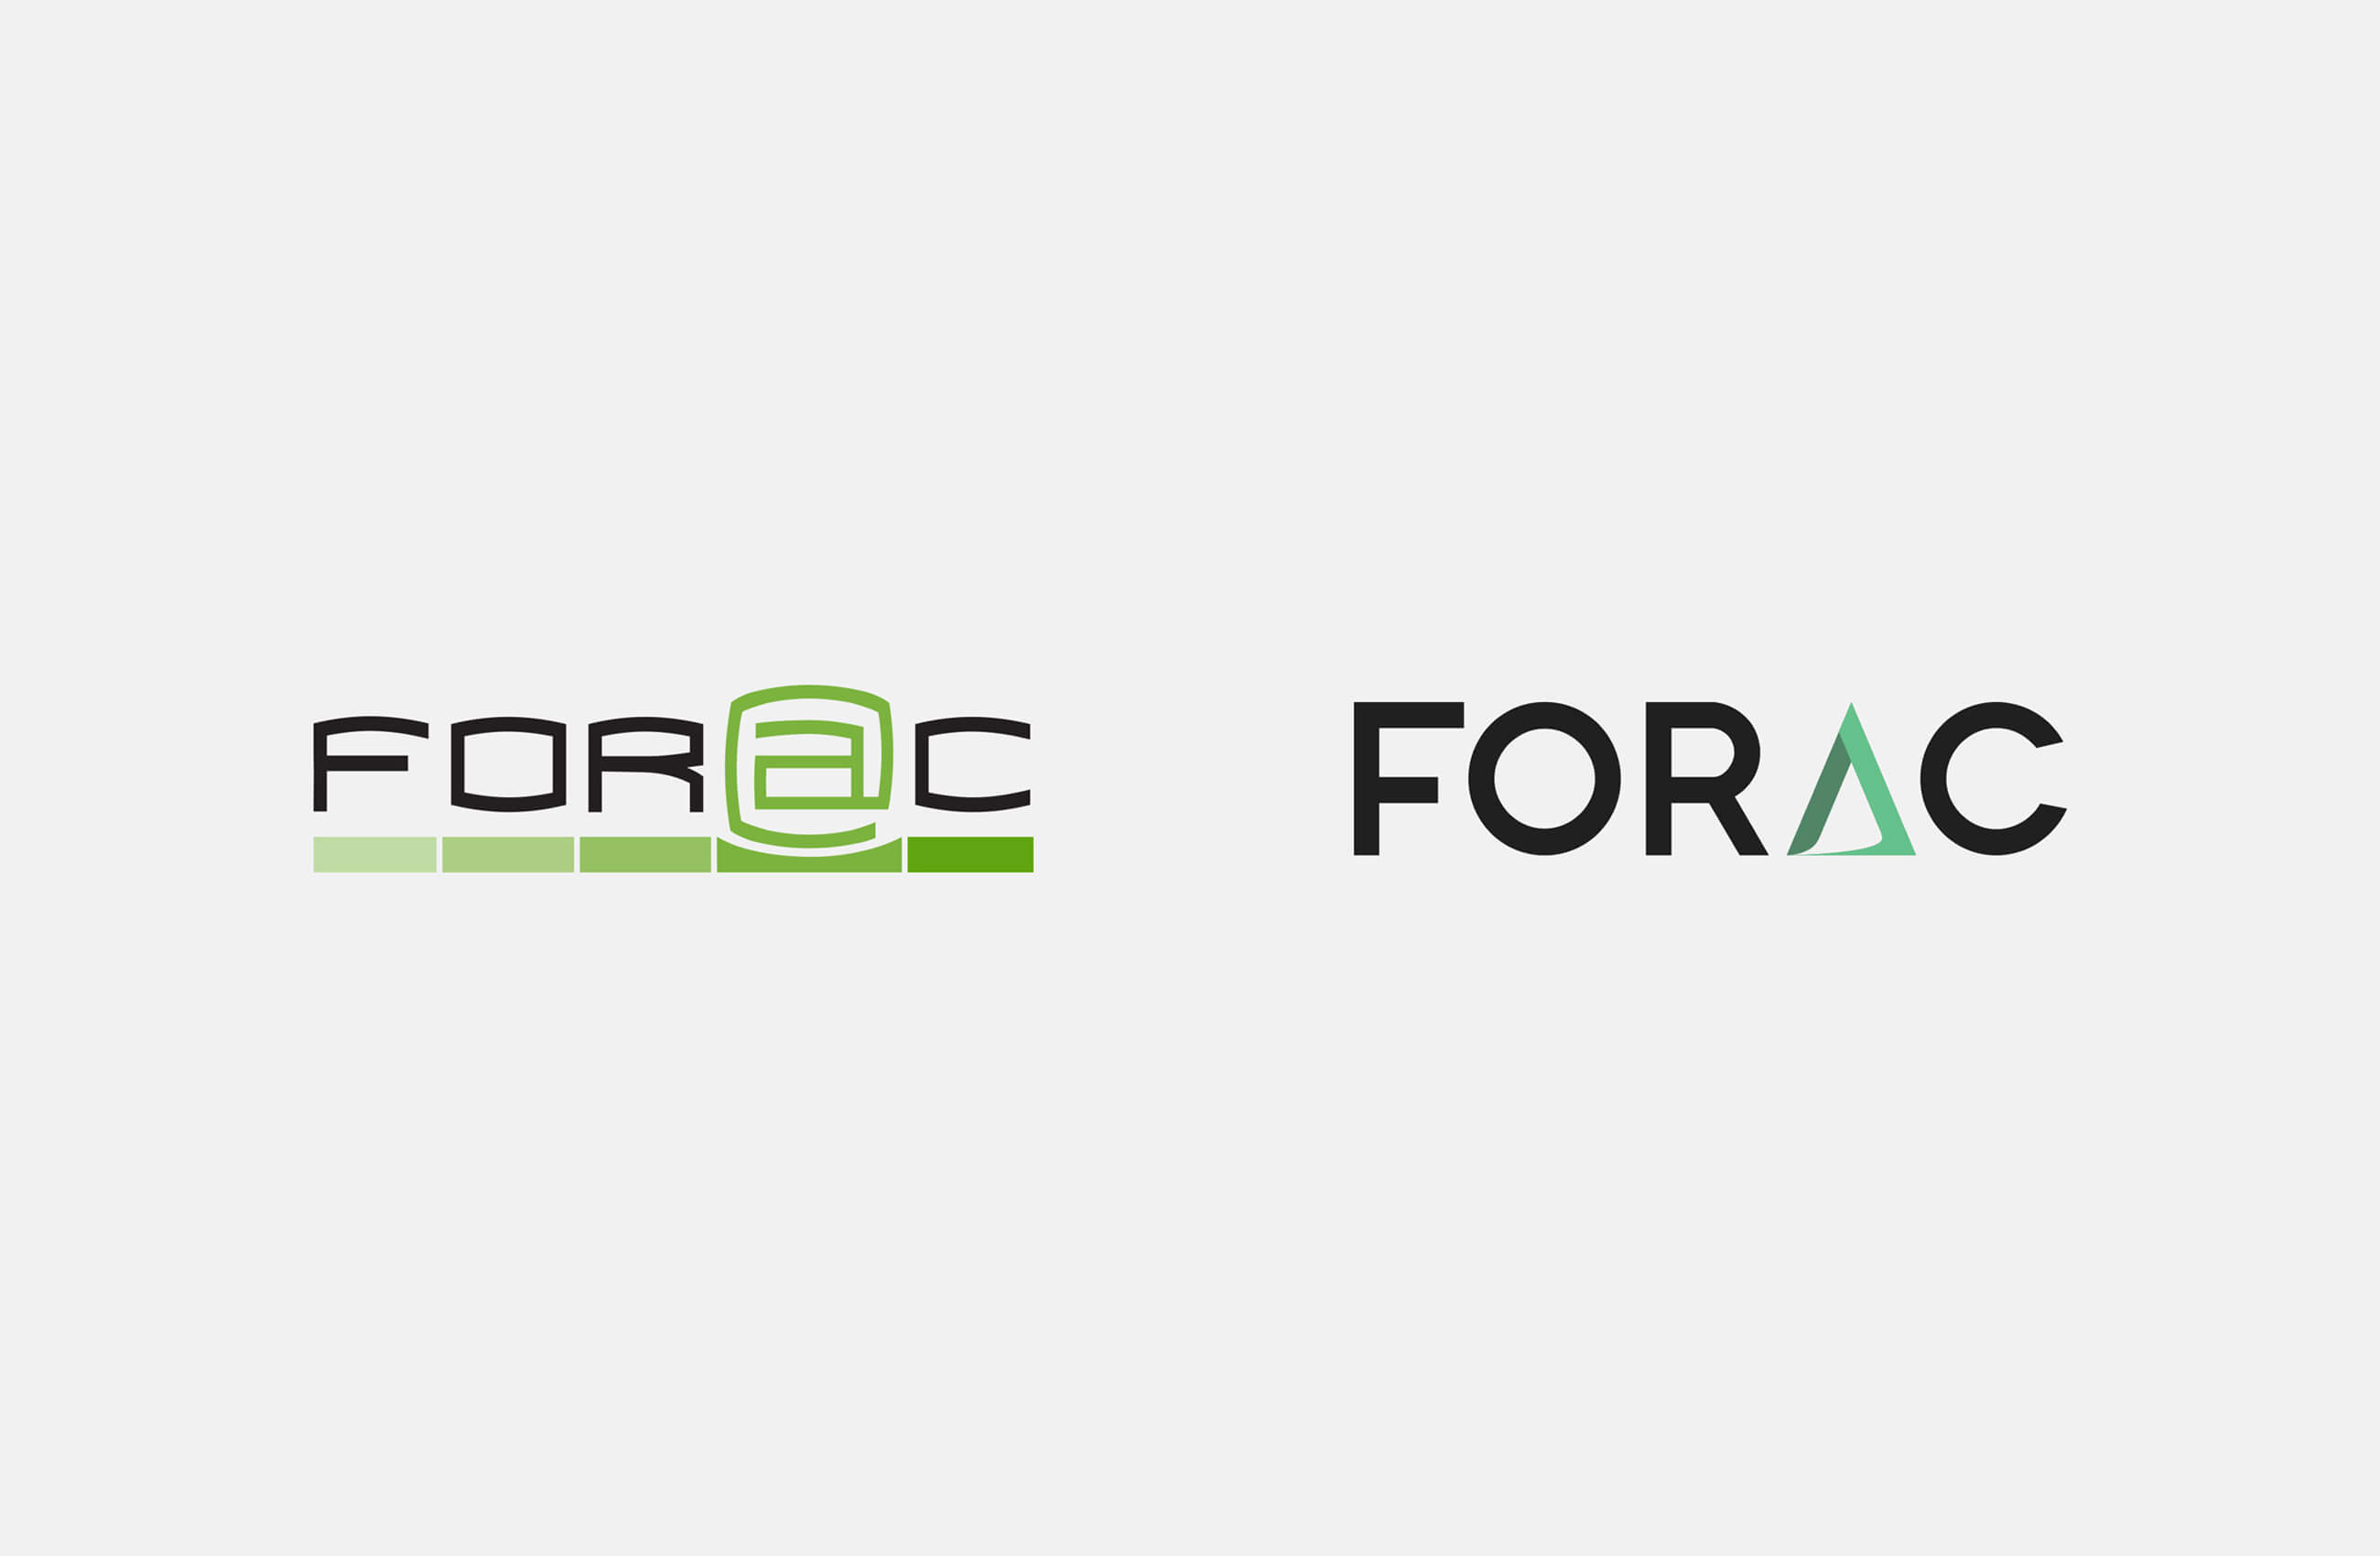 Logo comparaison FORAC